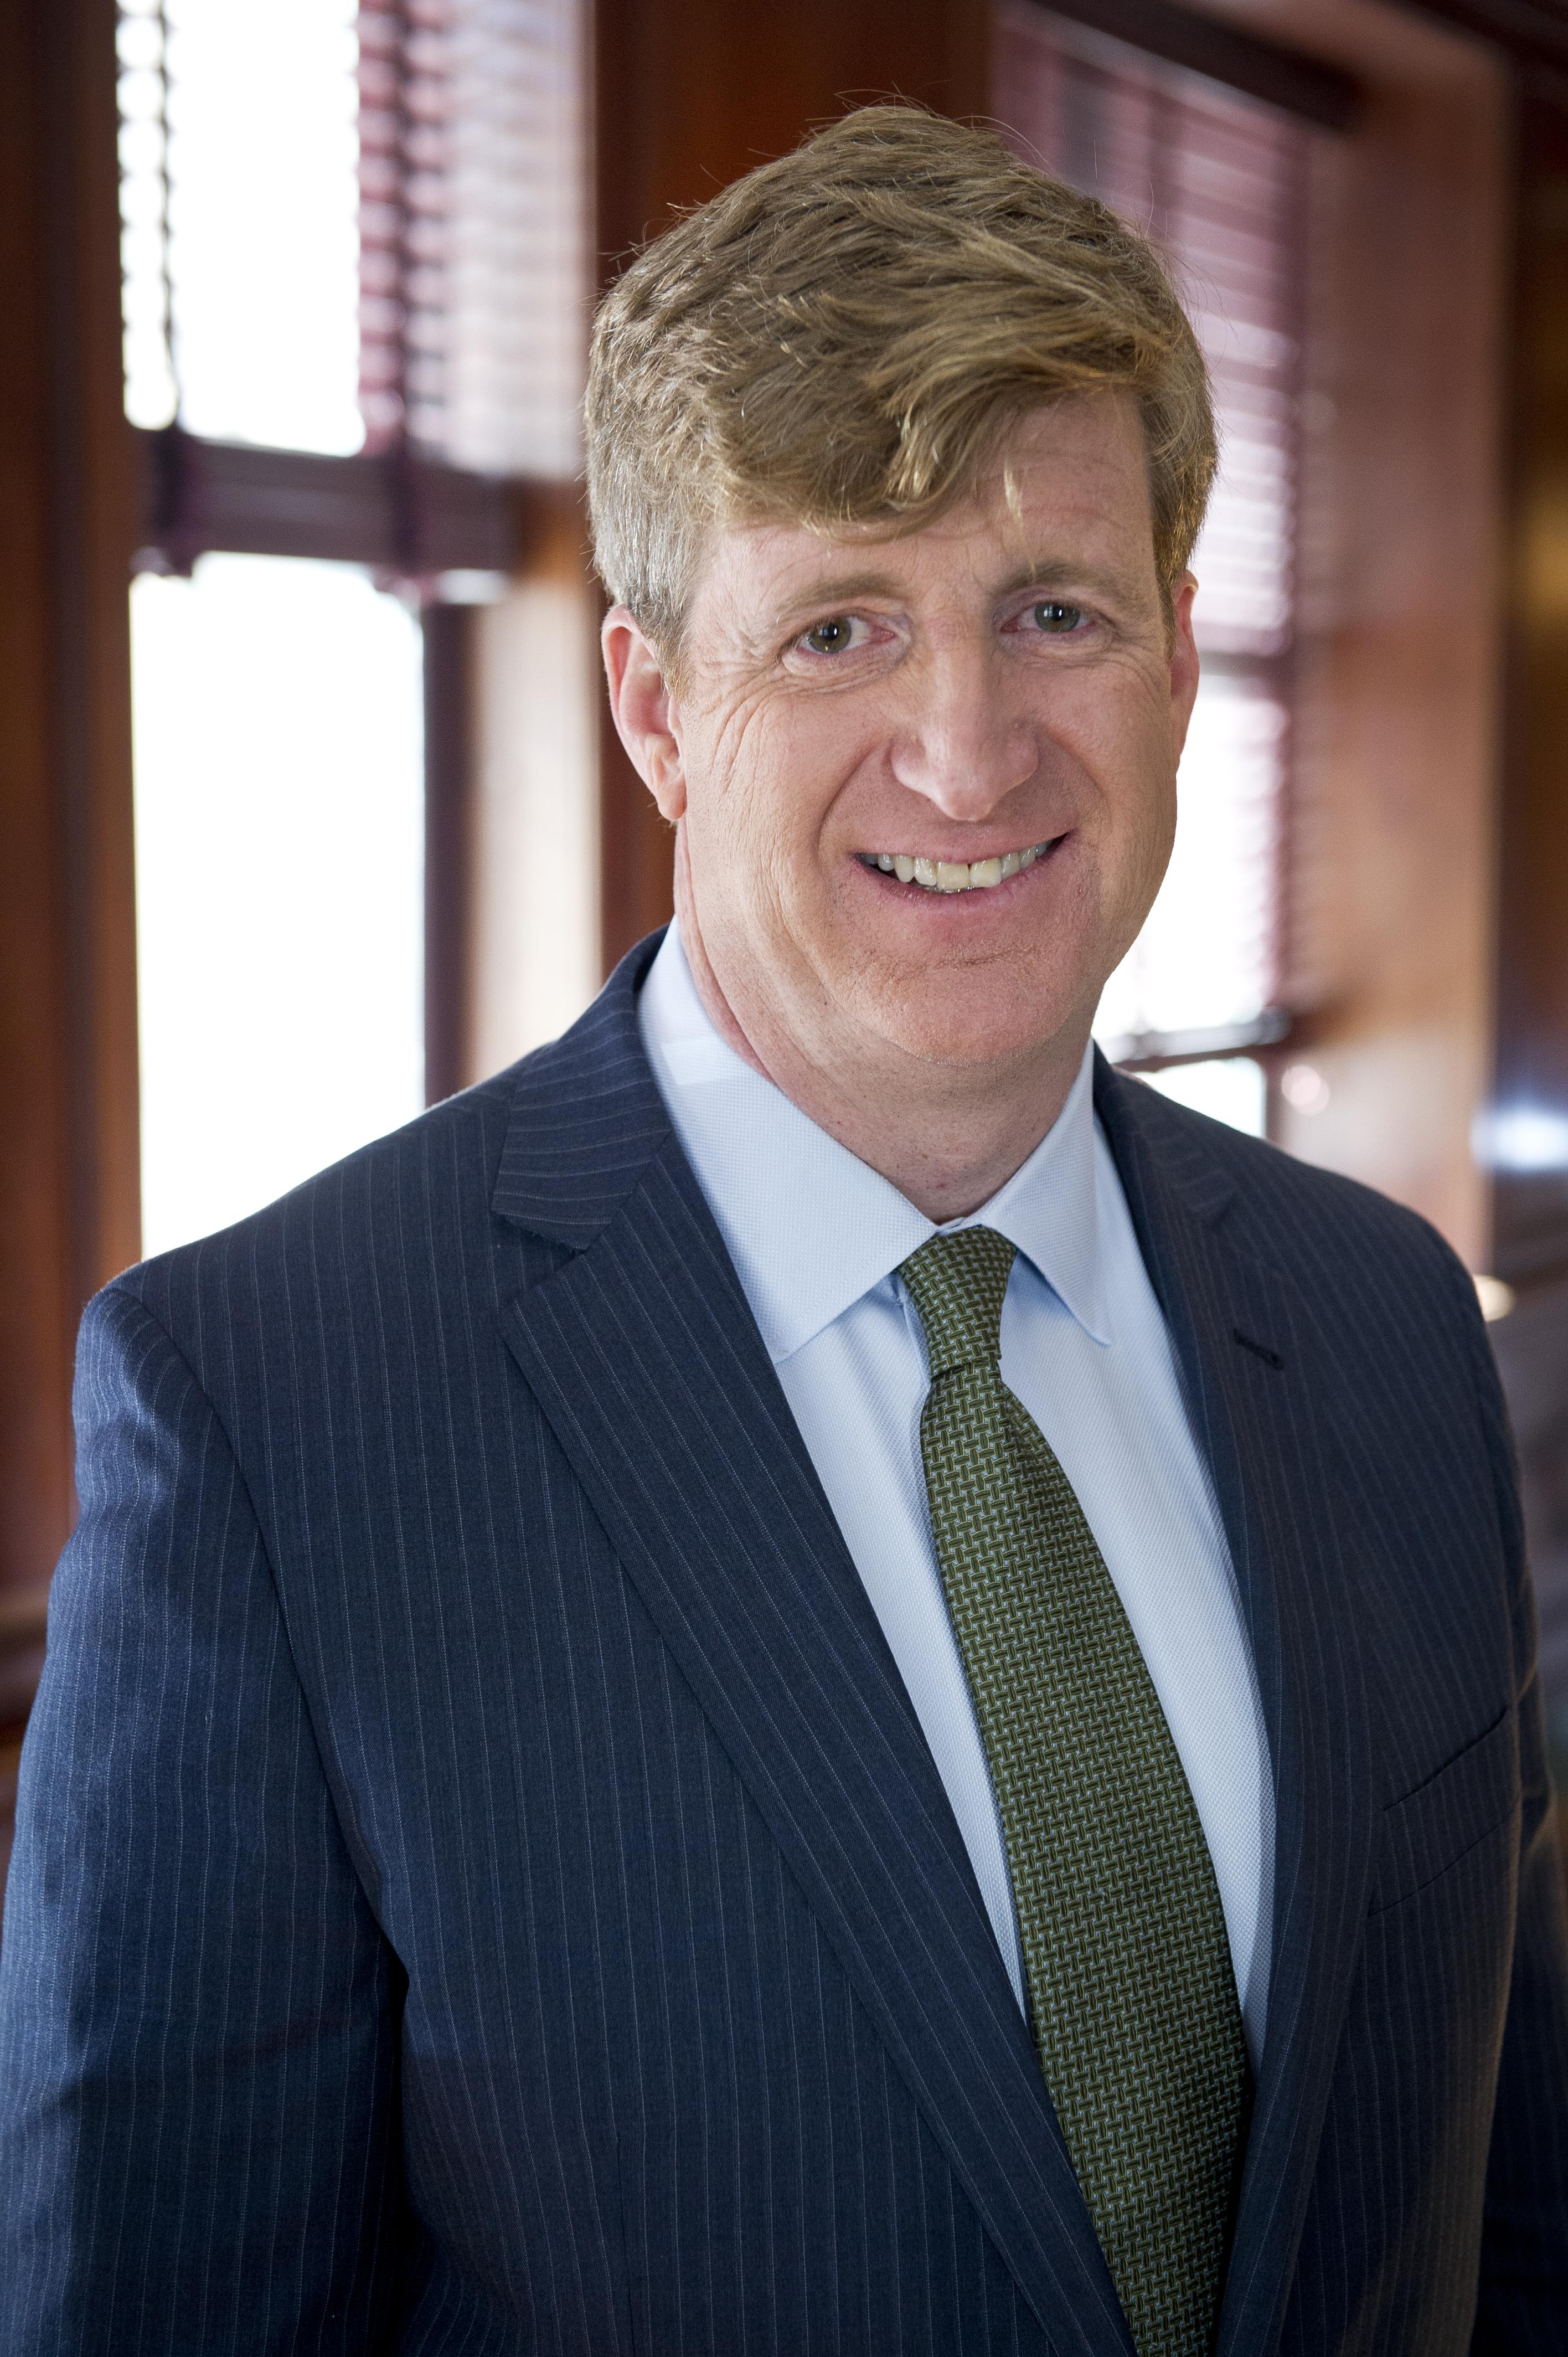 Patrick J. Kennedy joins Board of Directors